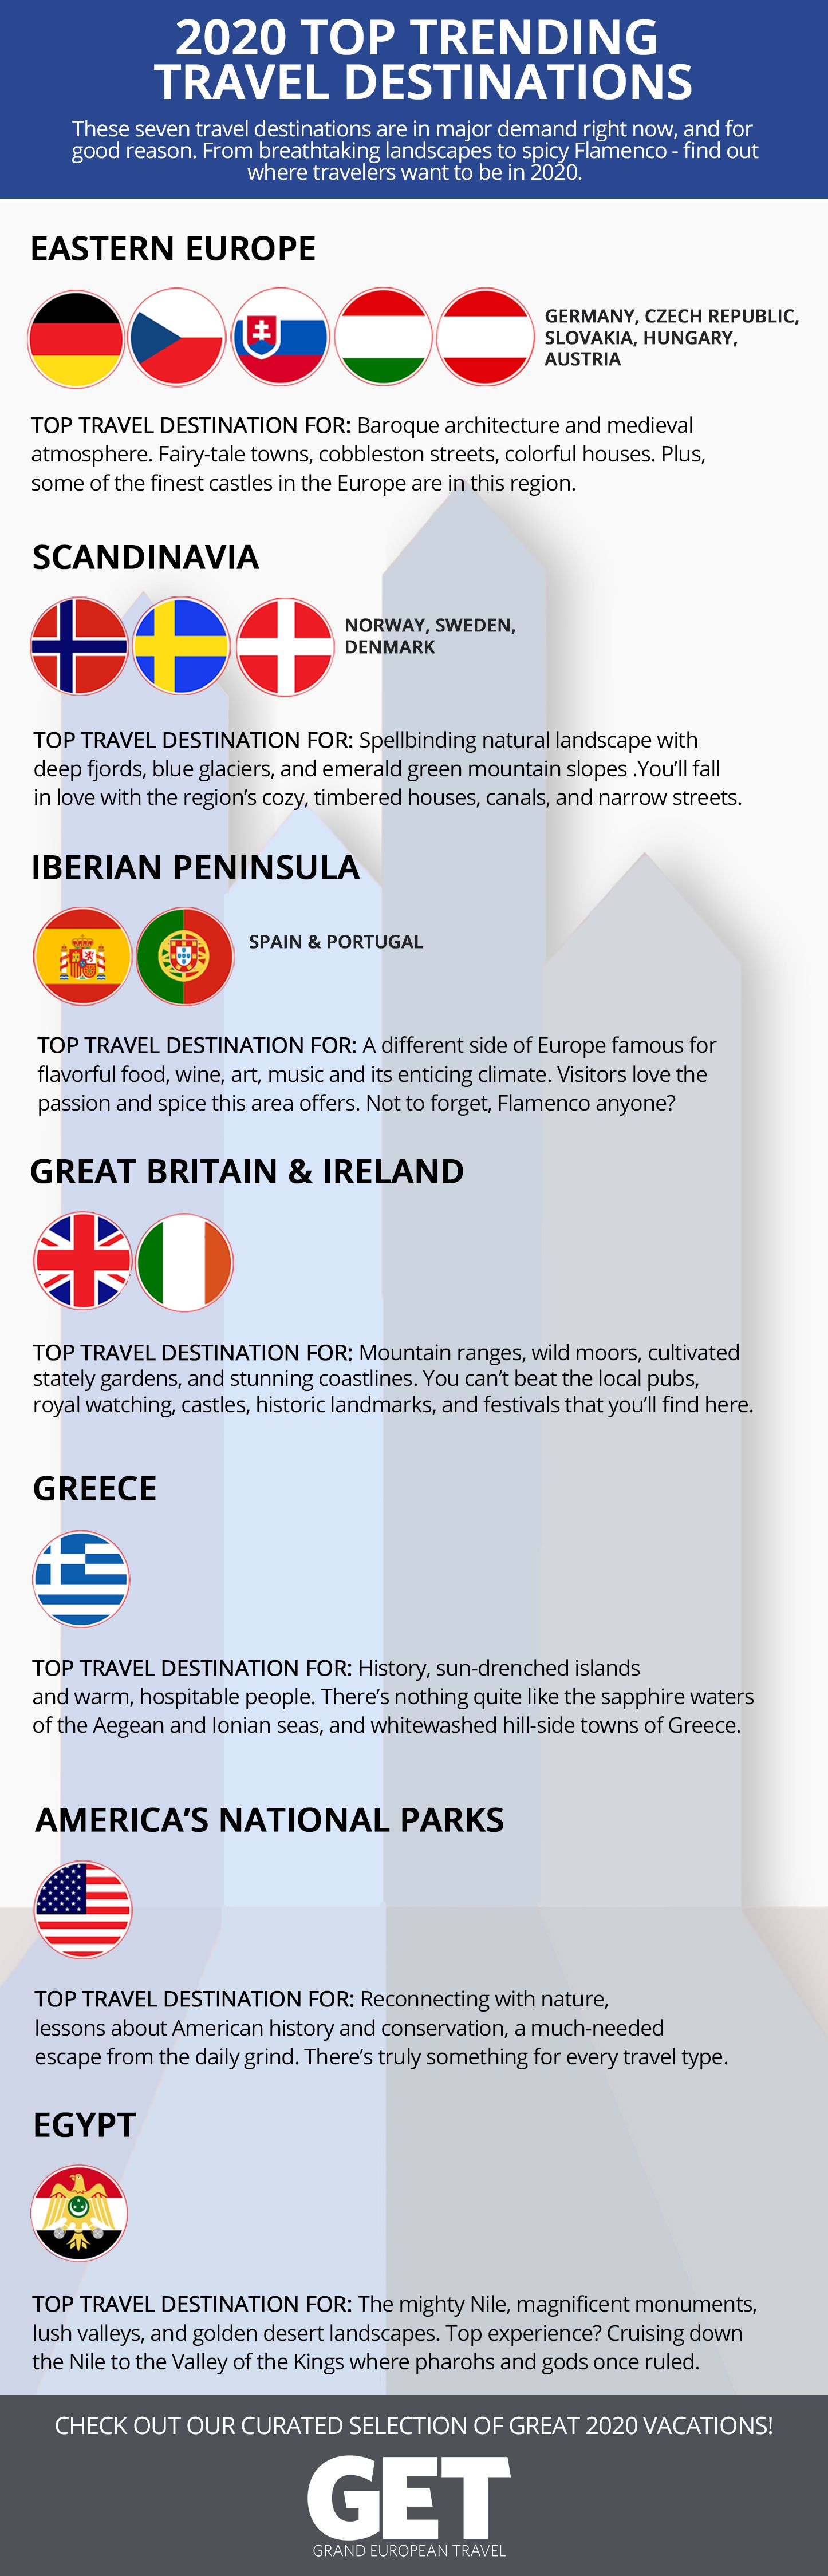 Get S Top Trending Travel Destinations For 2020 Travel Destinations European Vacation Packages European Travel